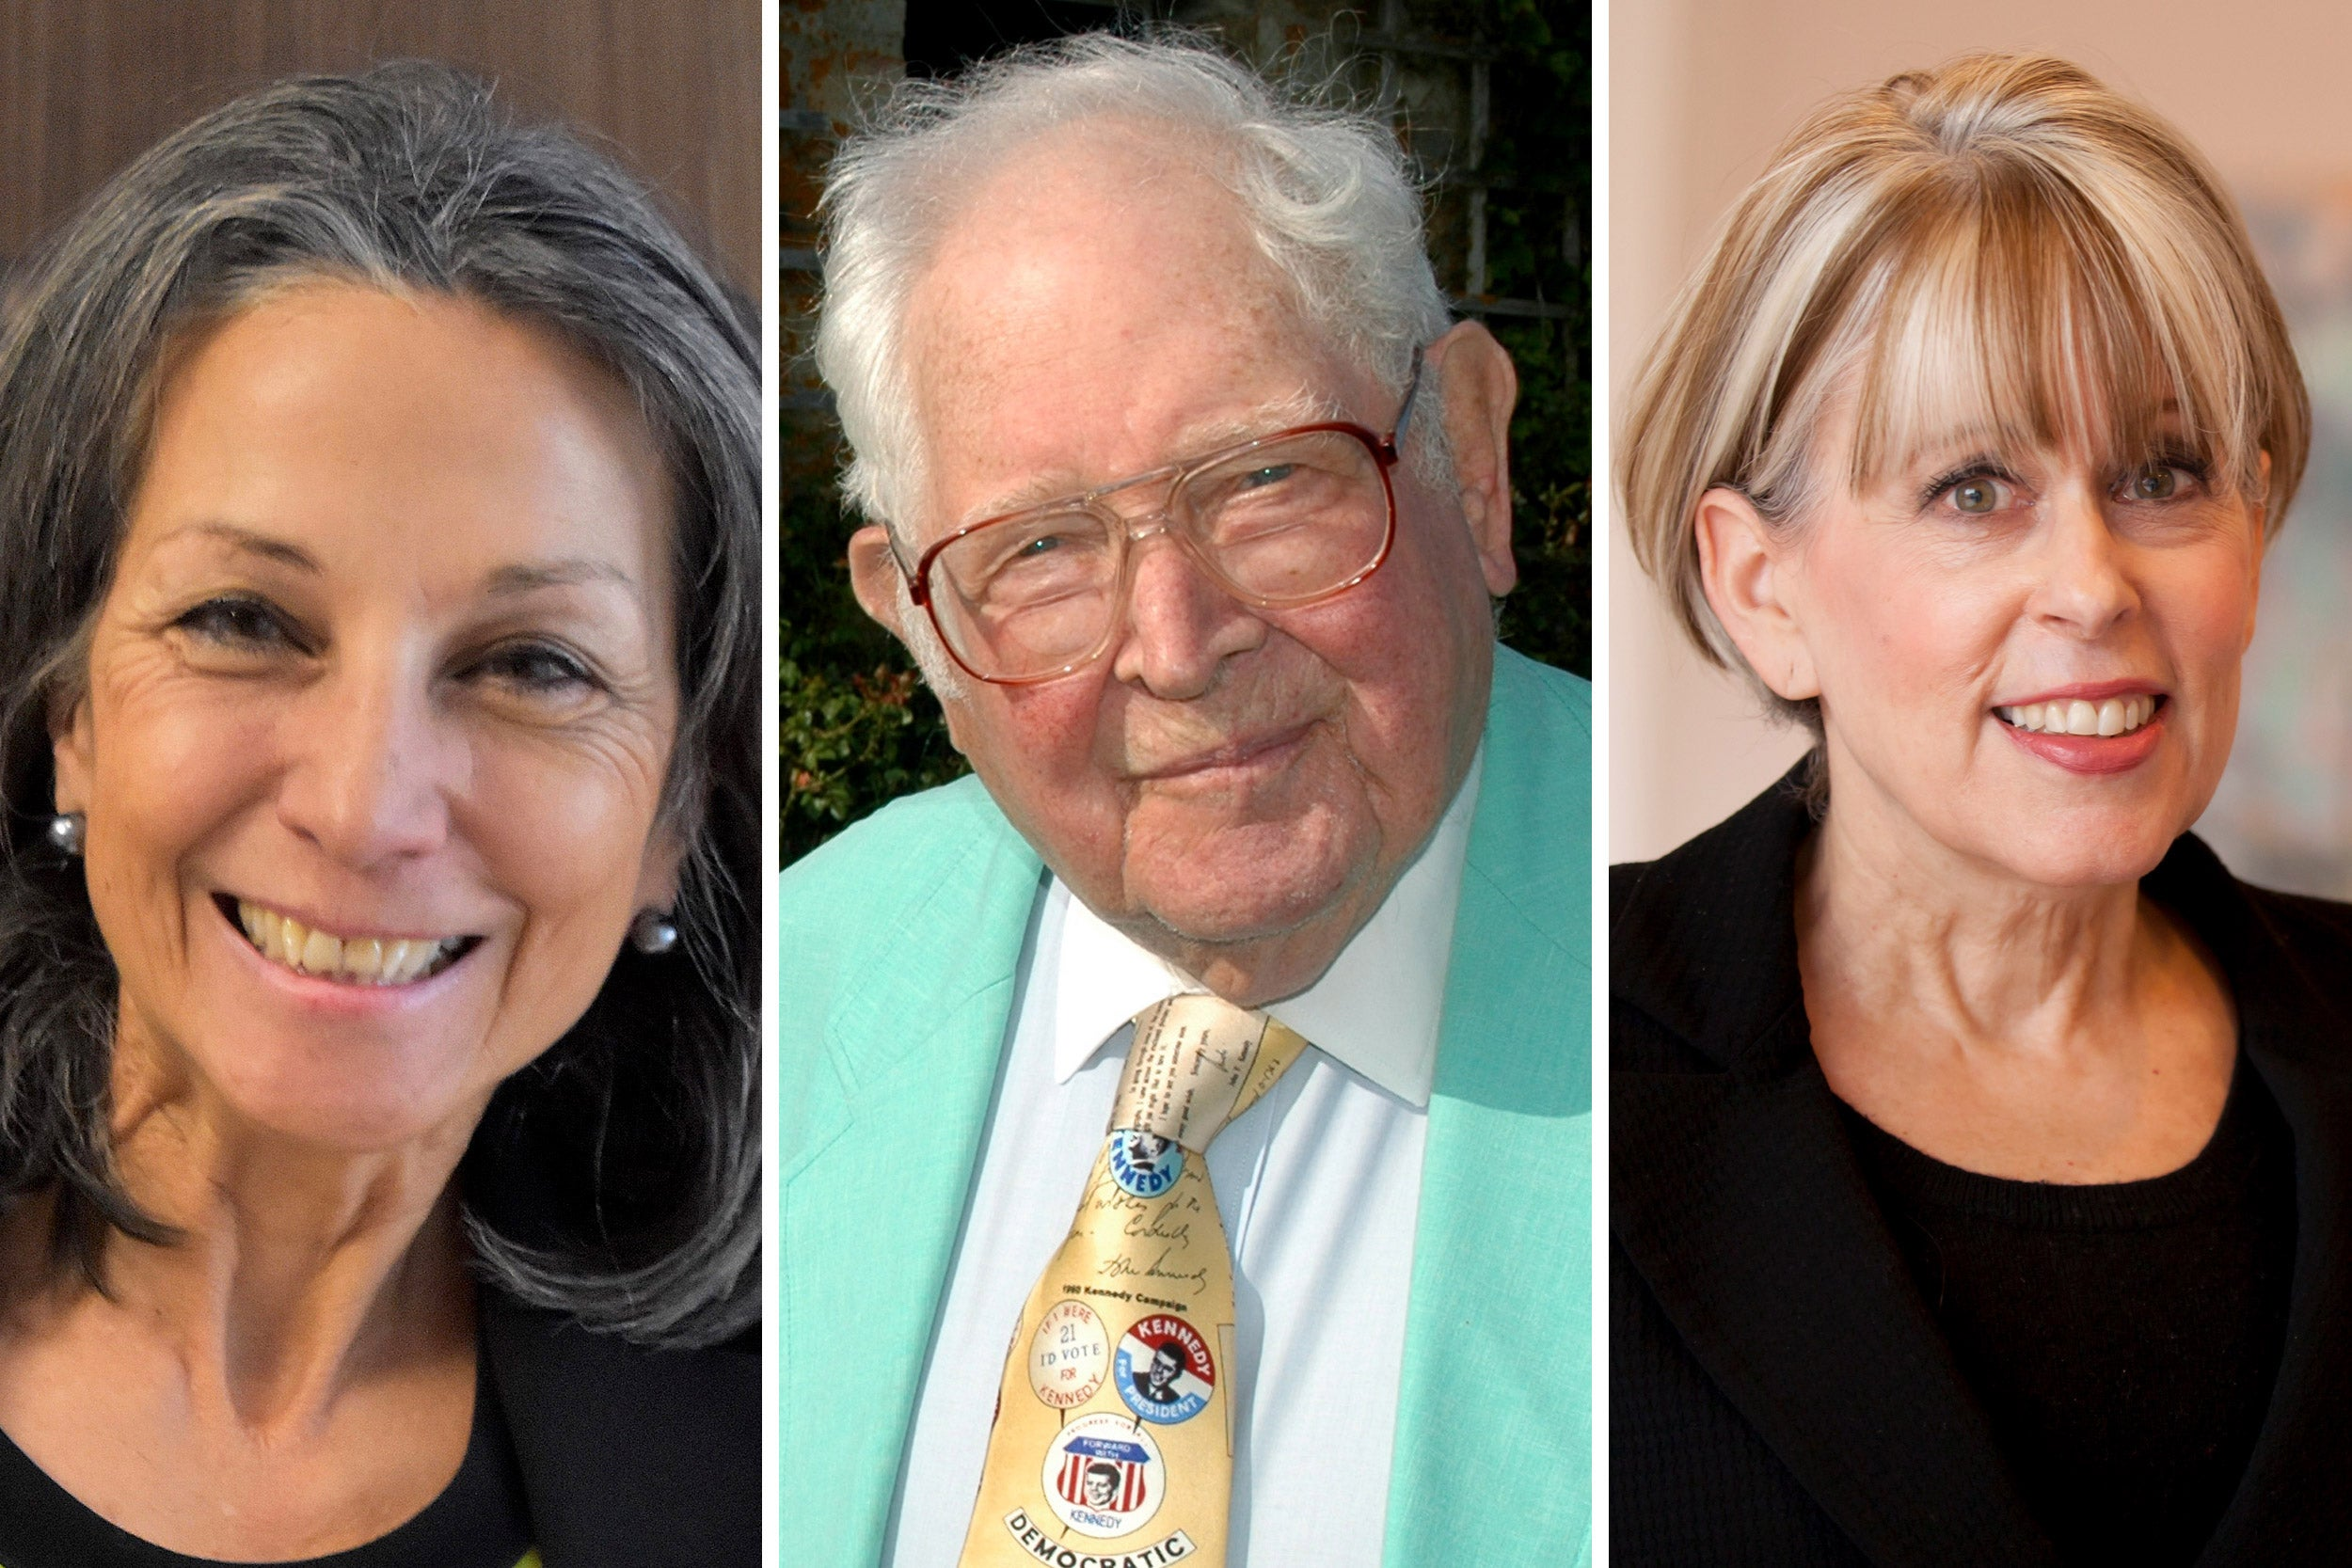 The HAA medalists are Teresita Alvarez-Bjelland '76, M.B.A. '79; Dan H. Fenn Jr. '44, A.M. '72; and Tamara Elliott Rogers '74.